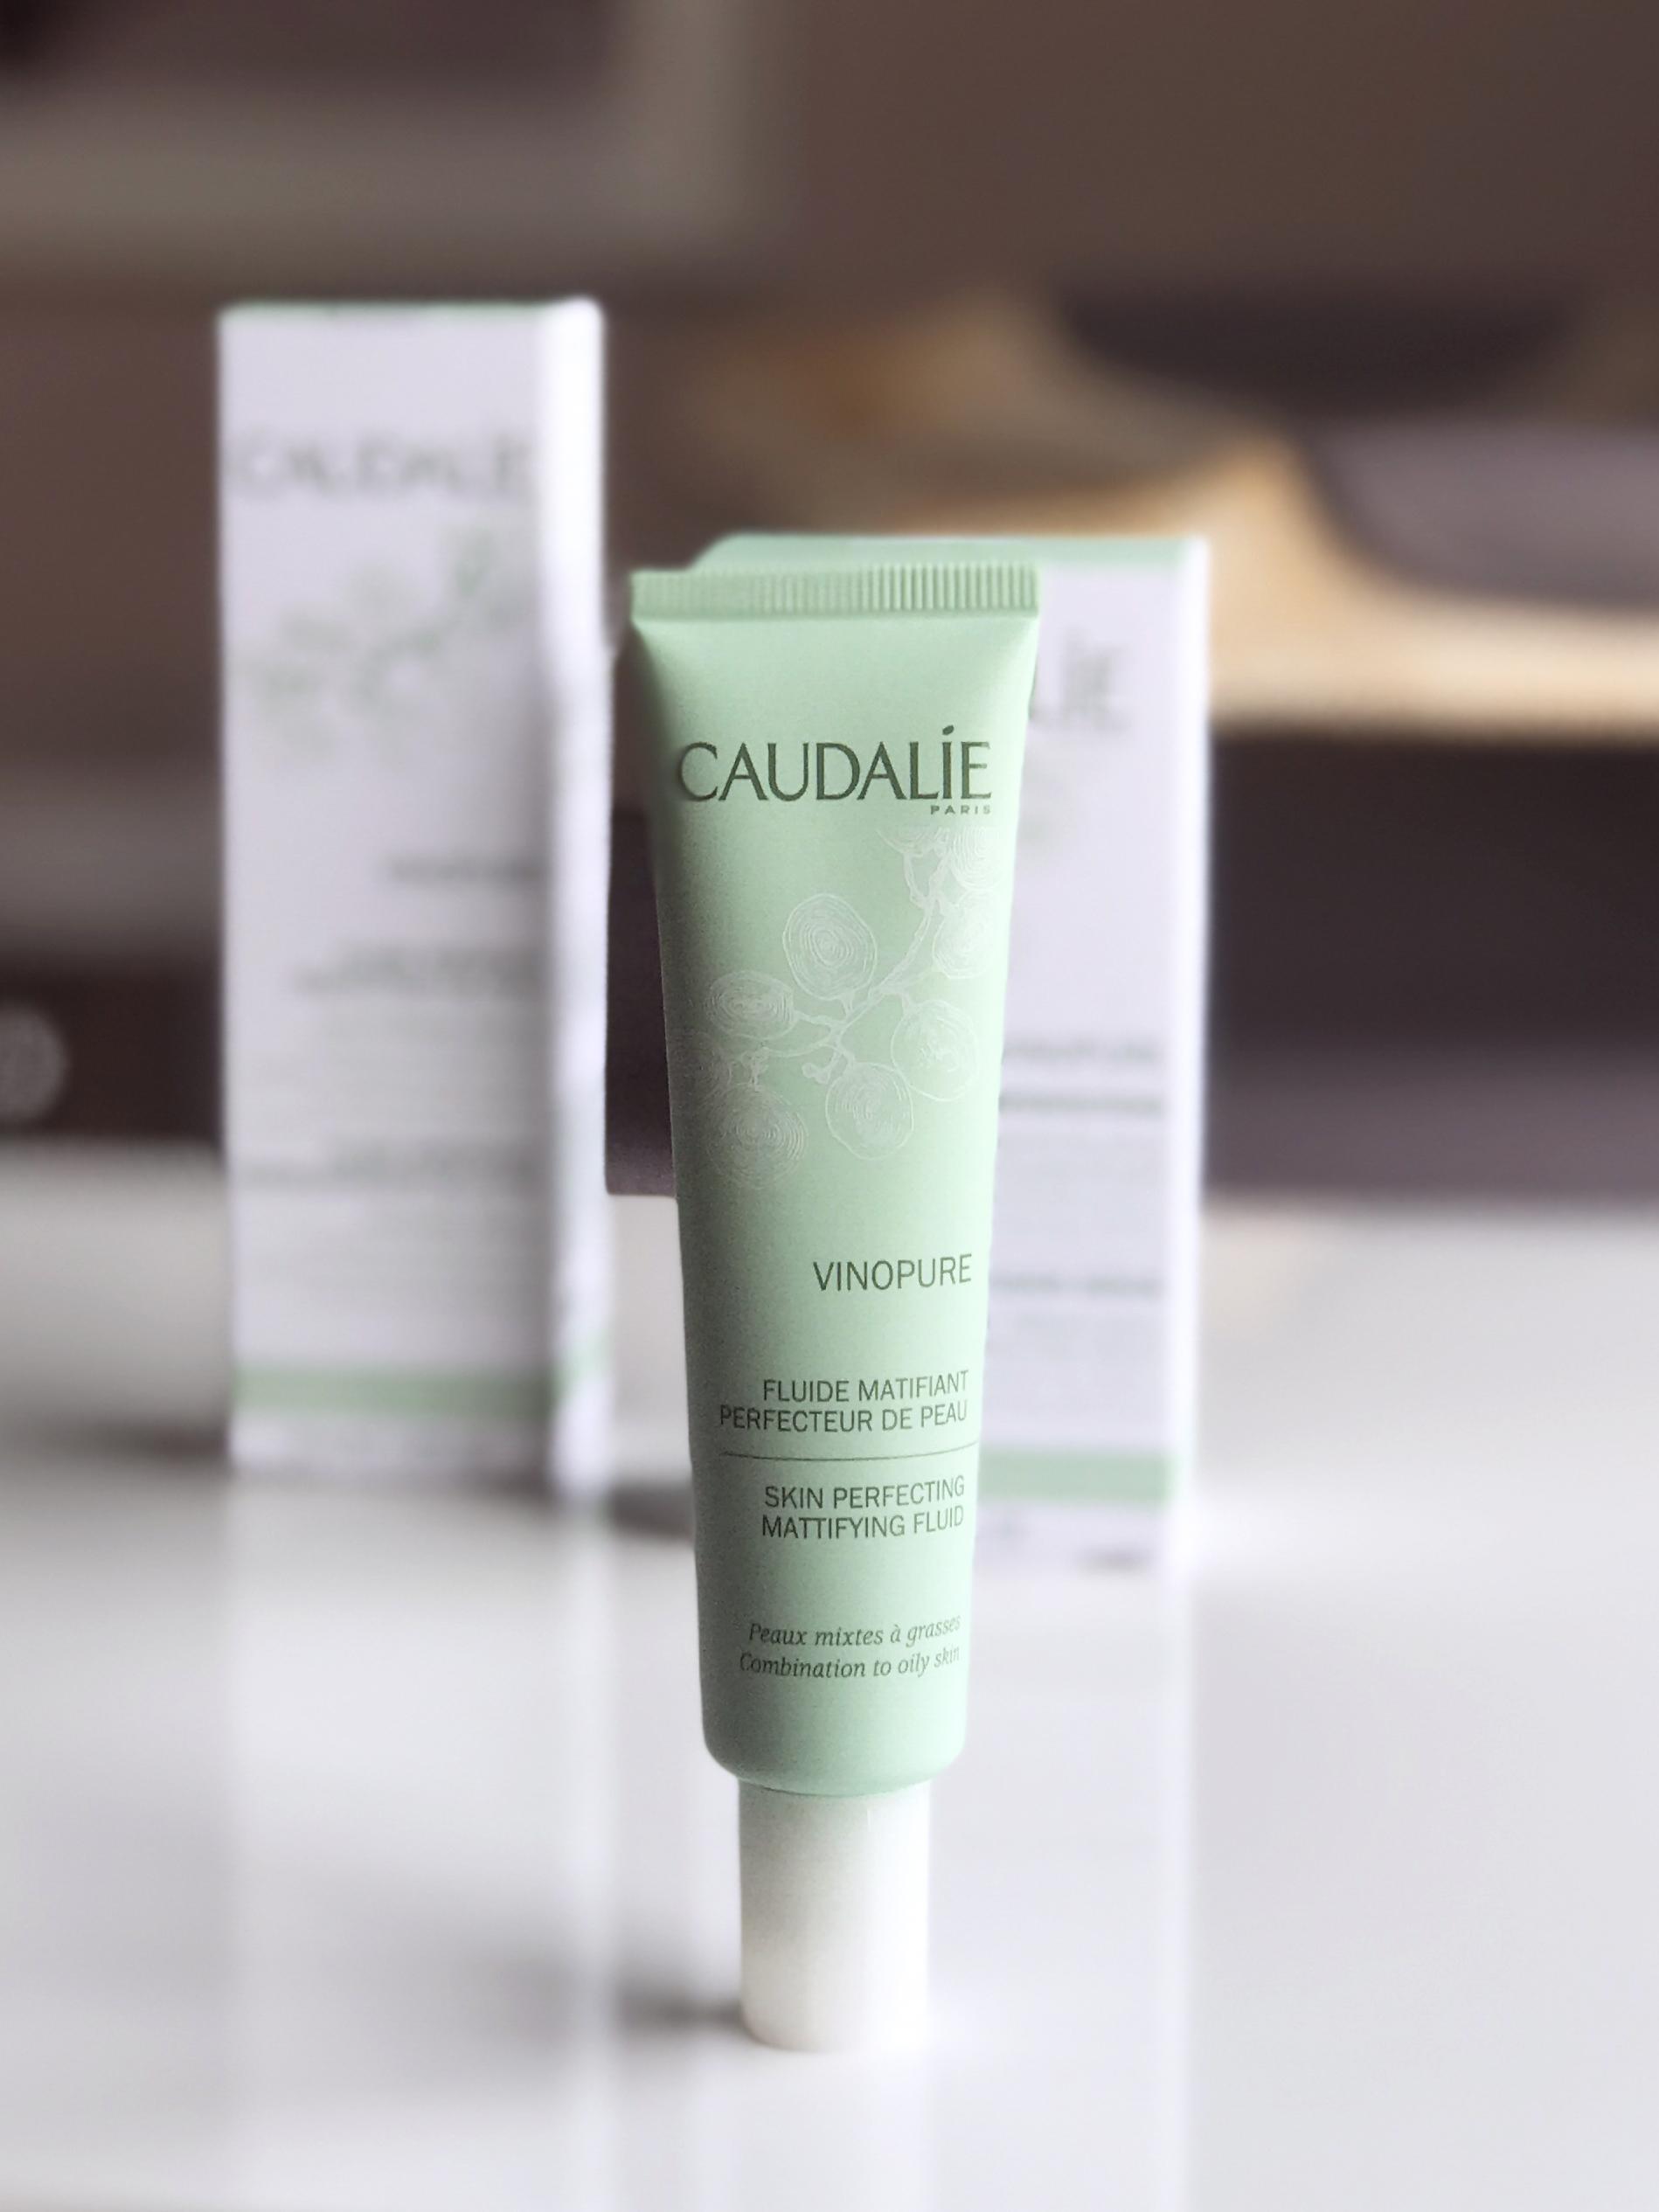 Caudalie Skin Perfecting Mattifying Fluid